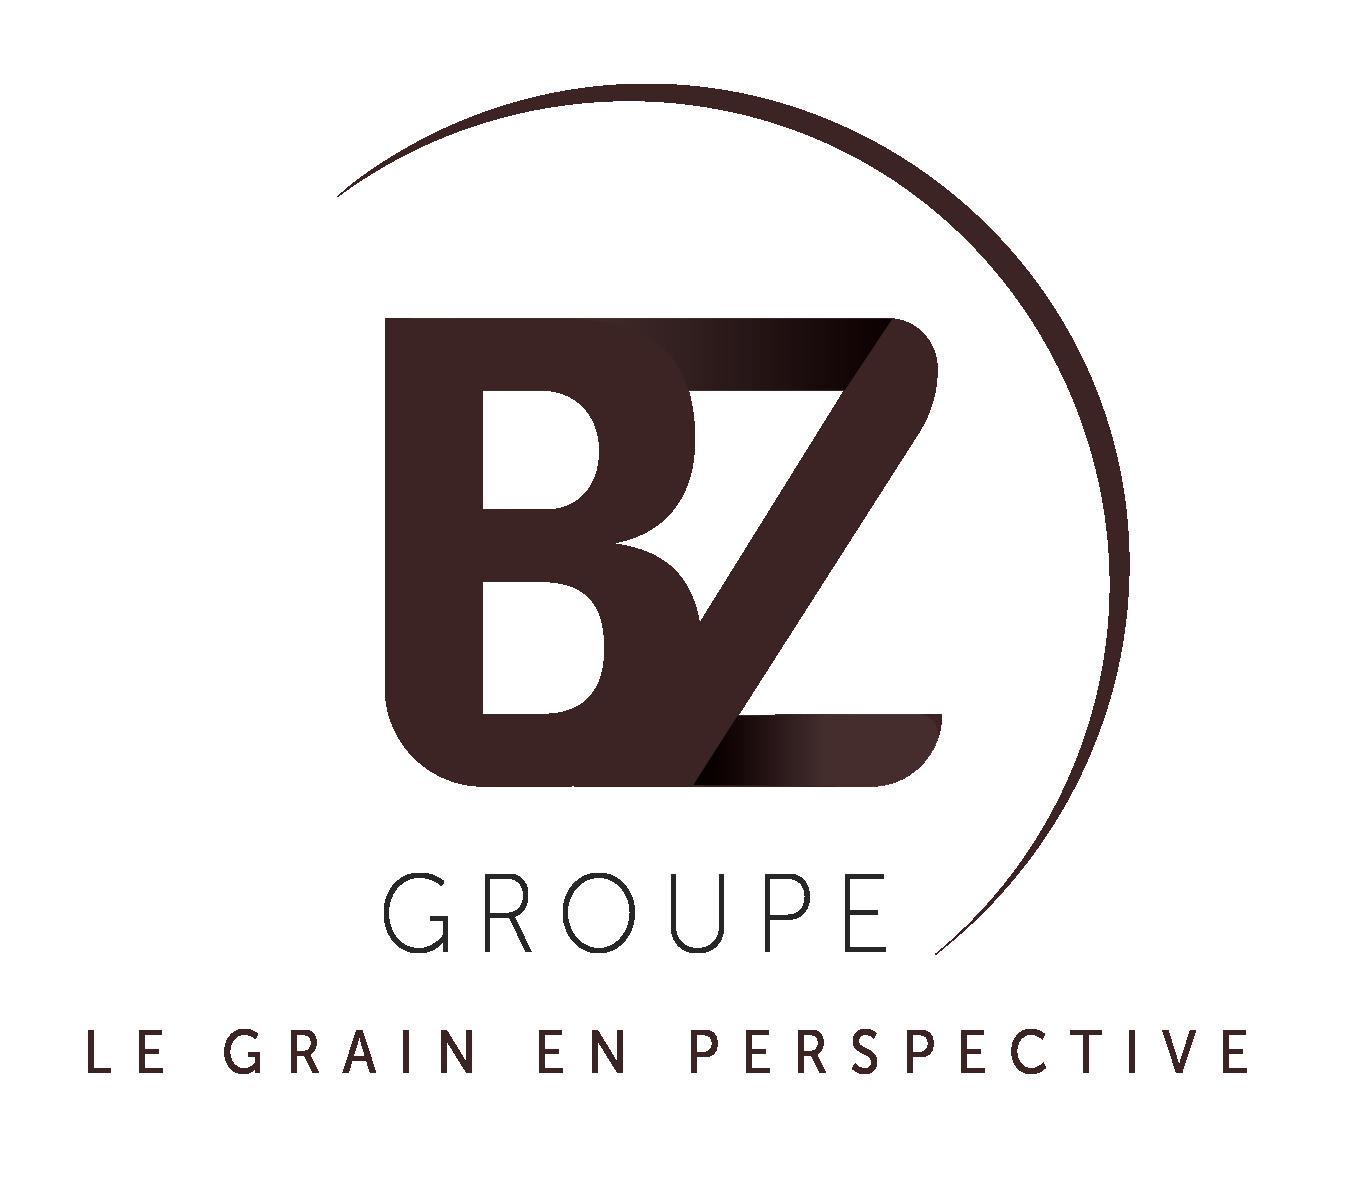 Groupe BZ